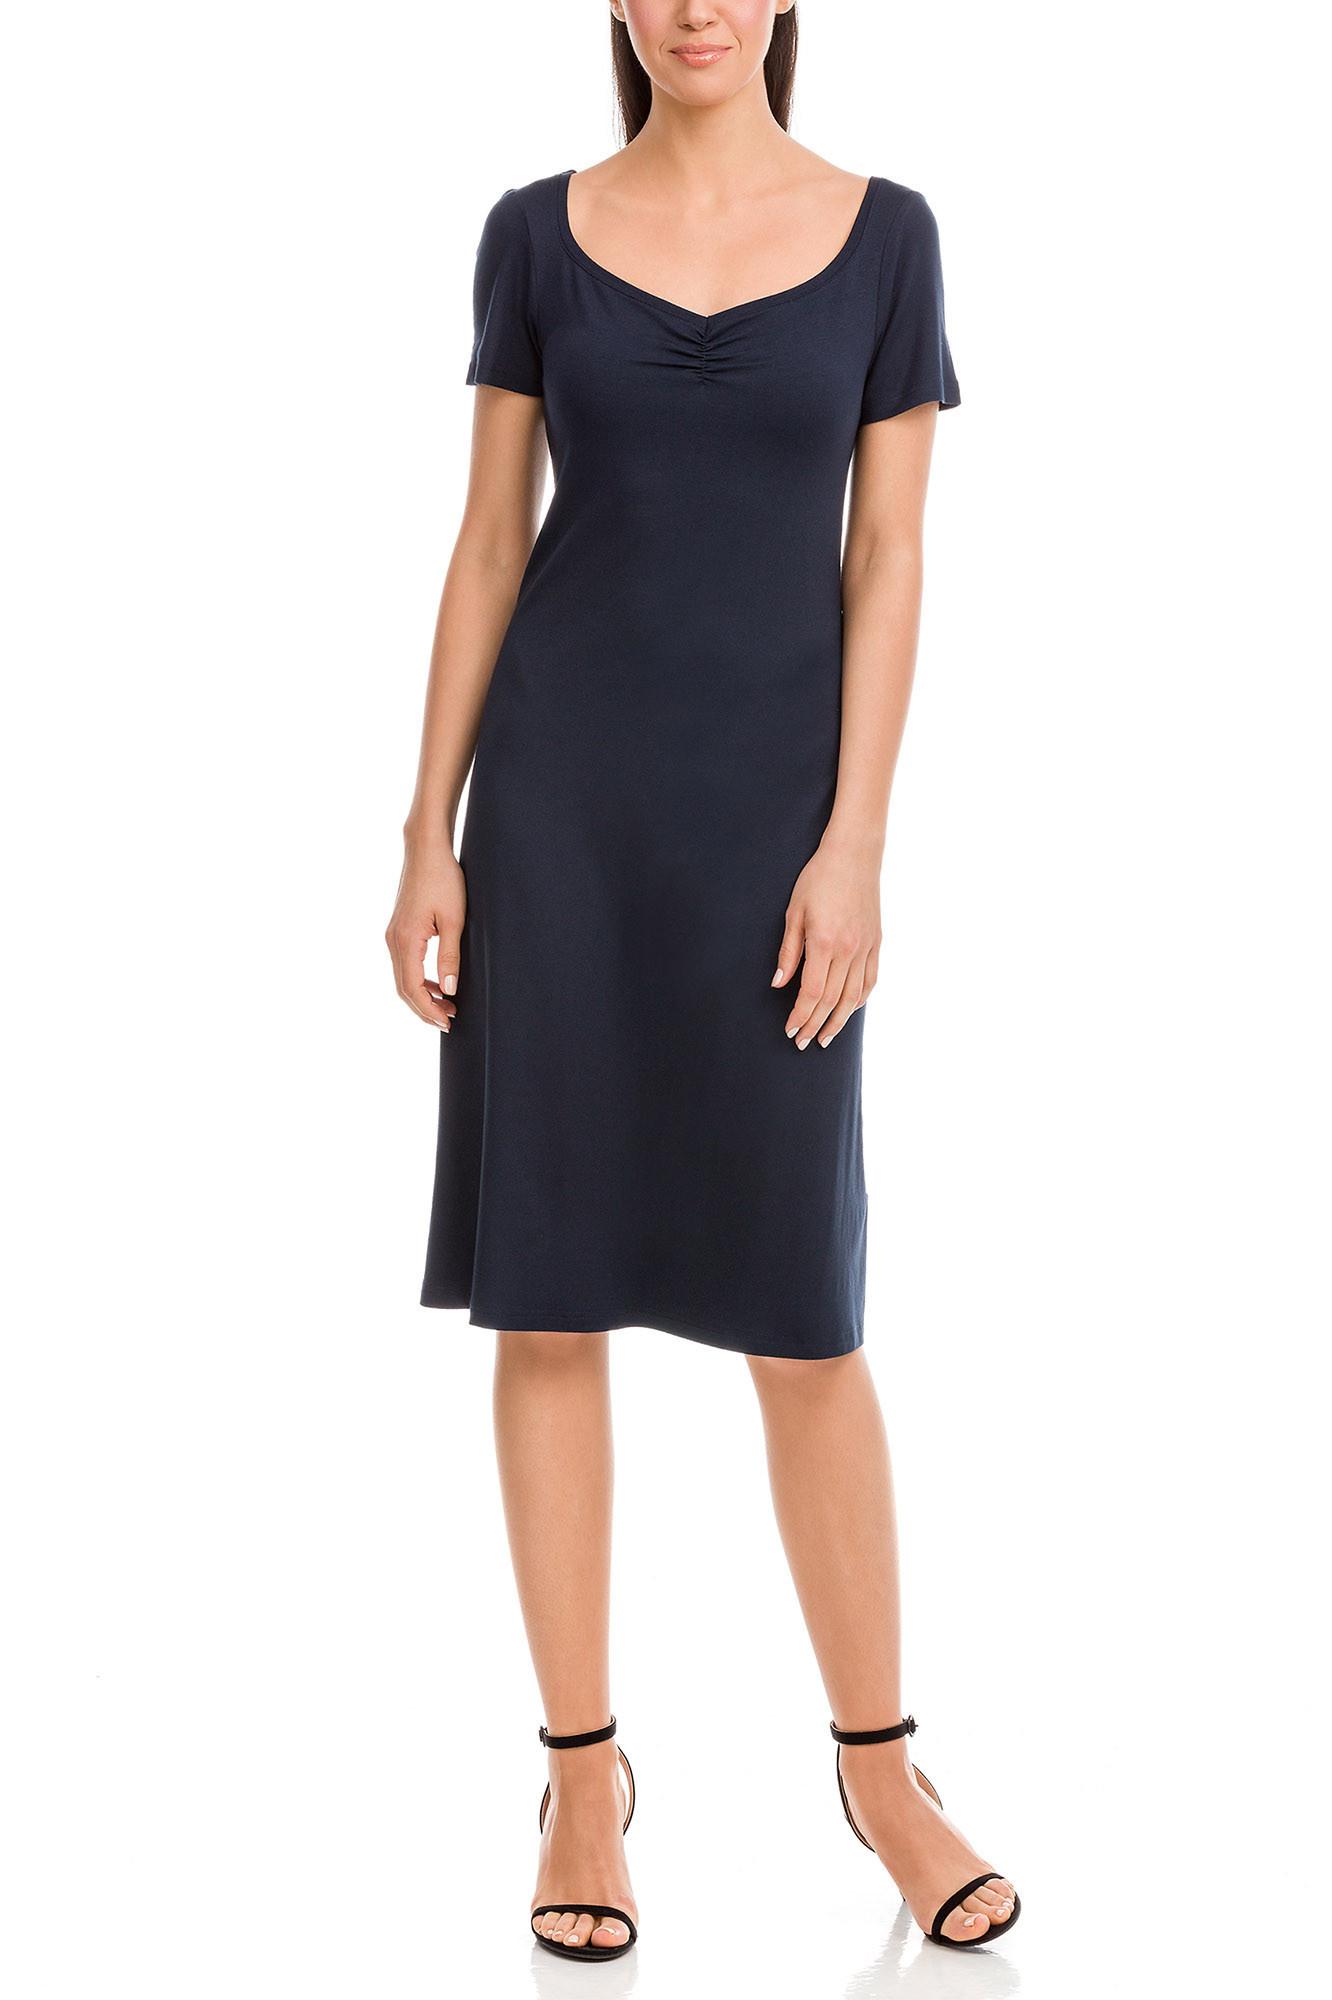 Vamp - Dámske šaty 12567 - Vamp blue s